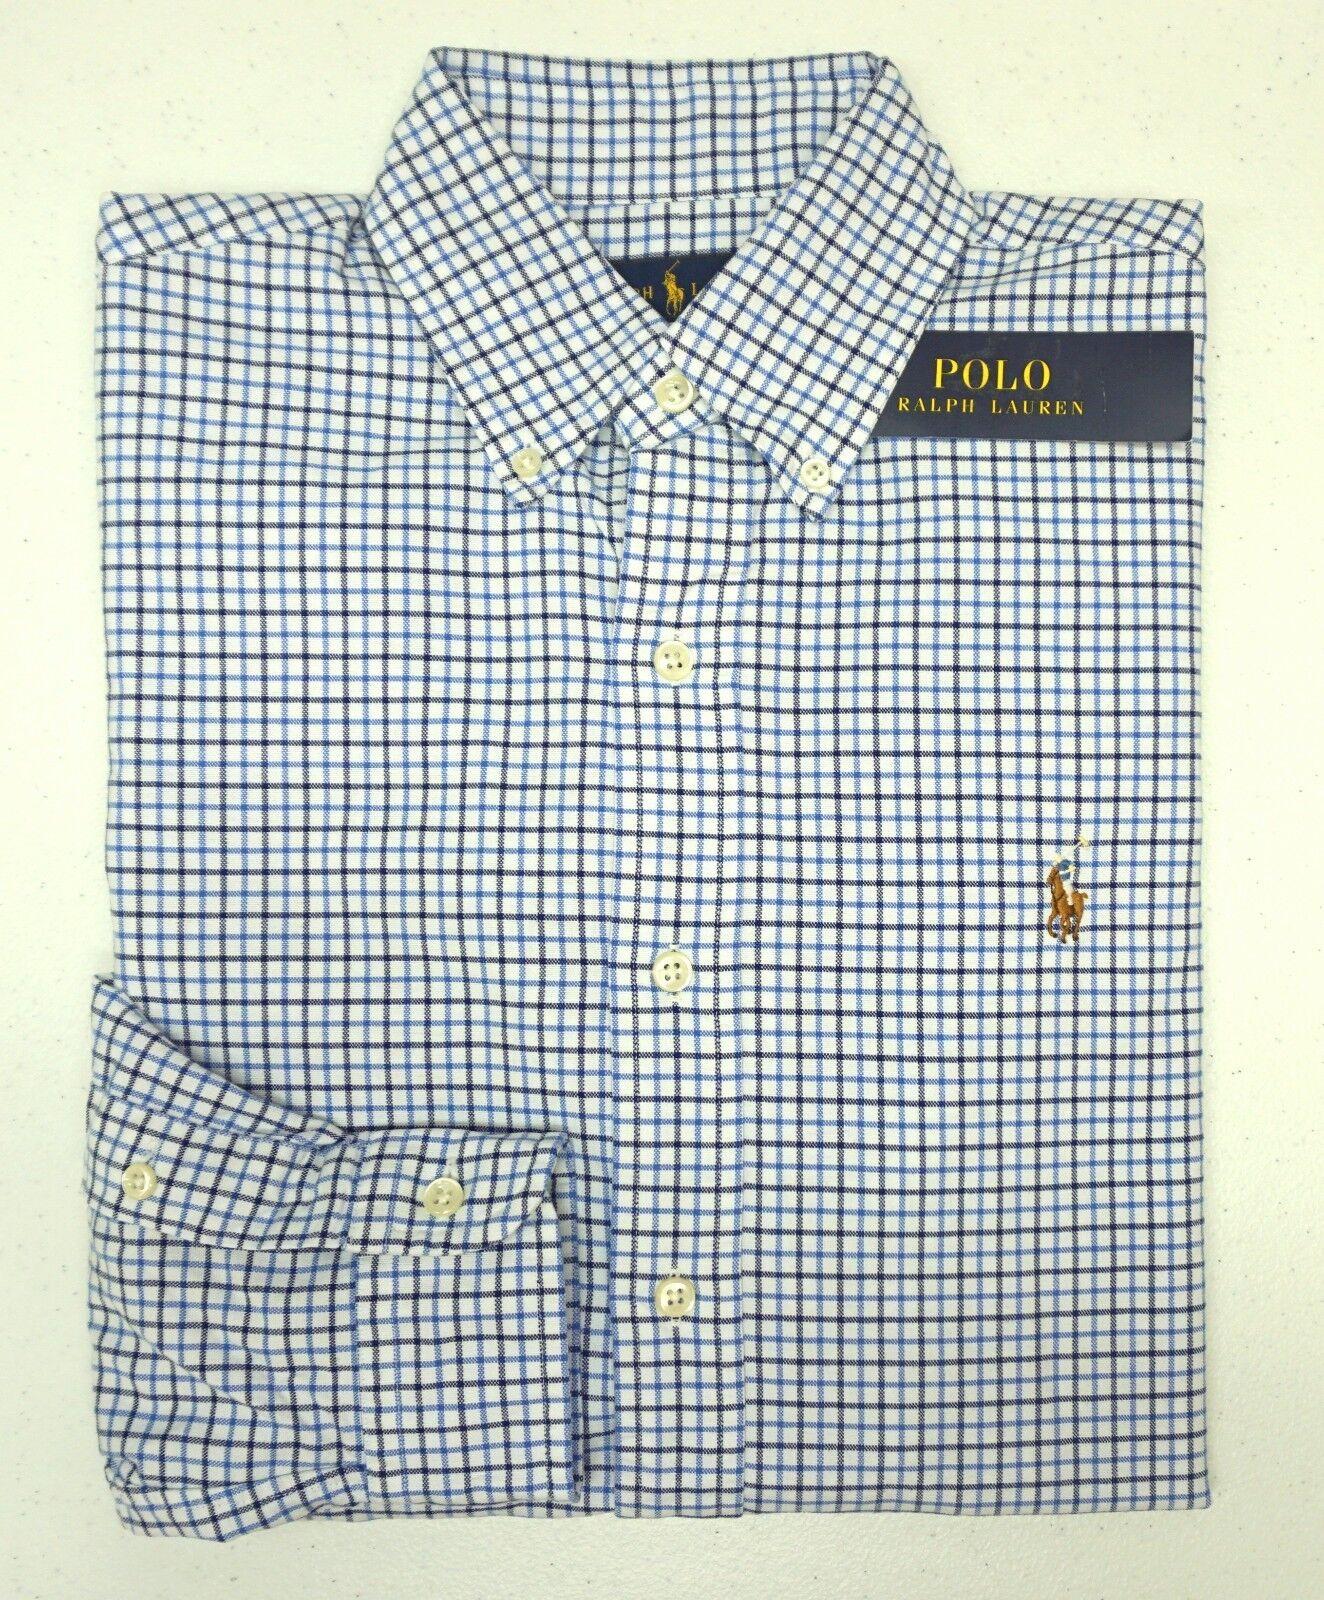 NWT  Polo Ralph Lauren bluee Plaid Shirt Mens Size S XXL Oxford Cotton LS NEW